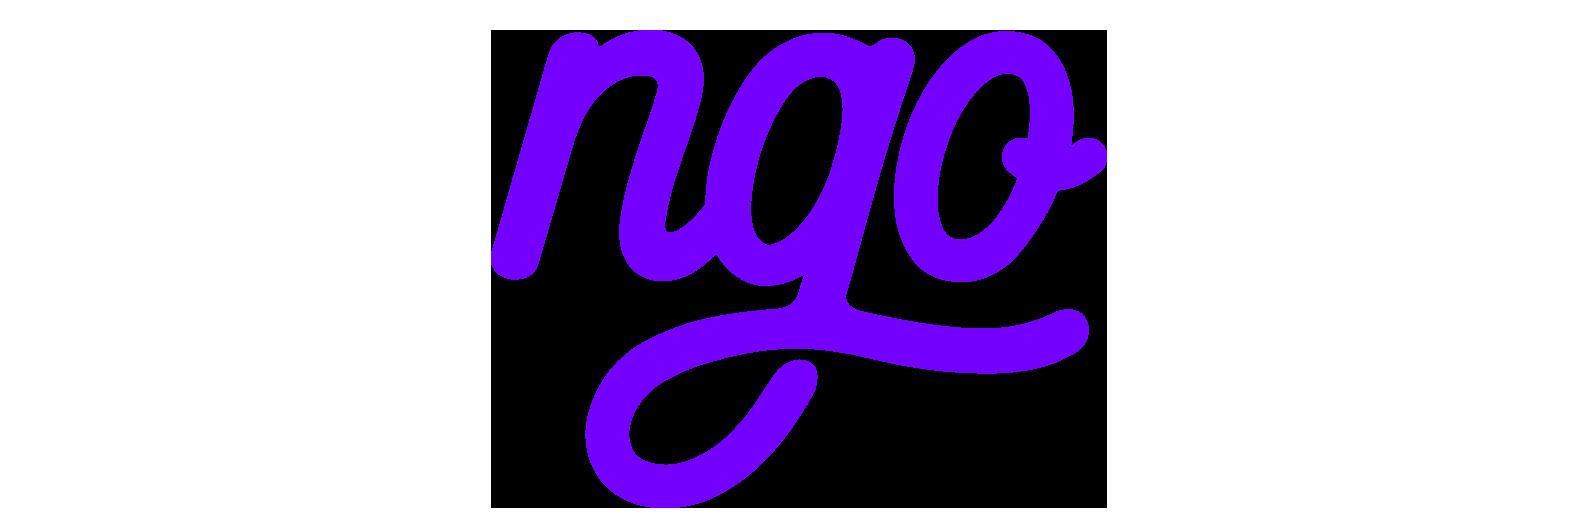 Benjamin Ngo